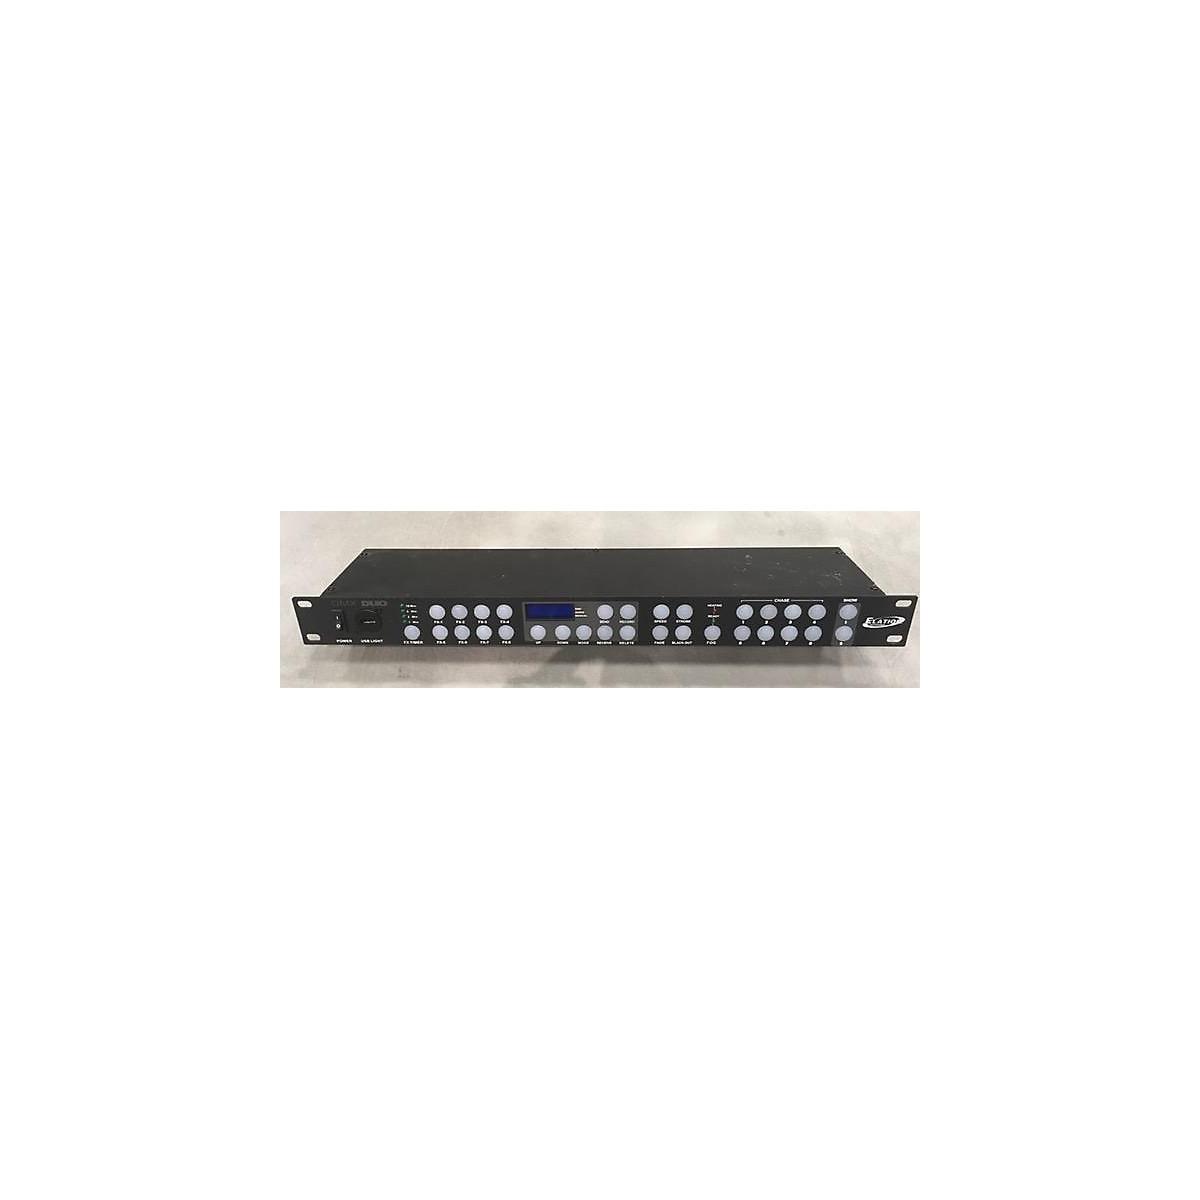 Elation Dmx Duo Lighting Controller